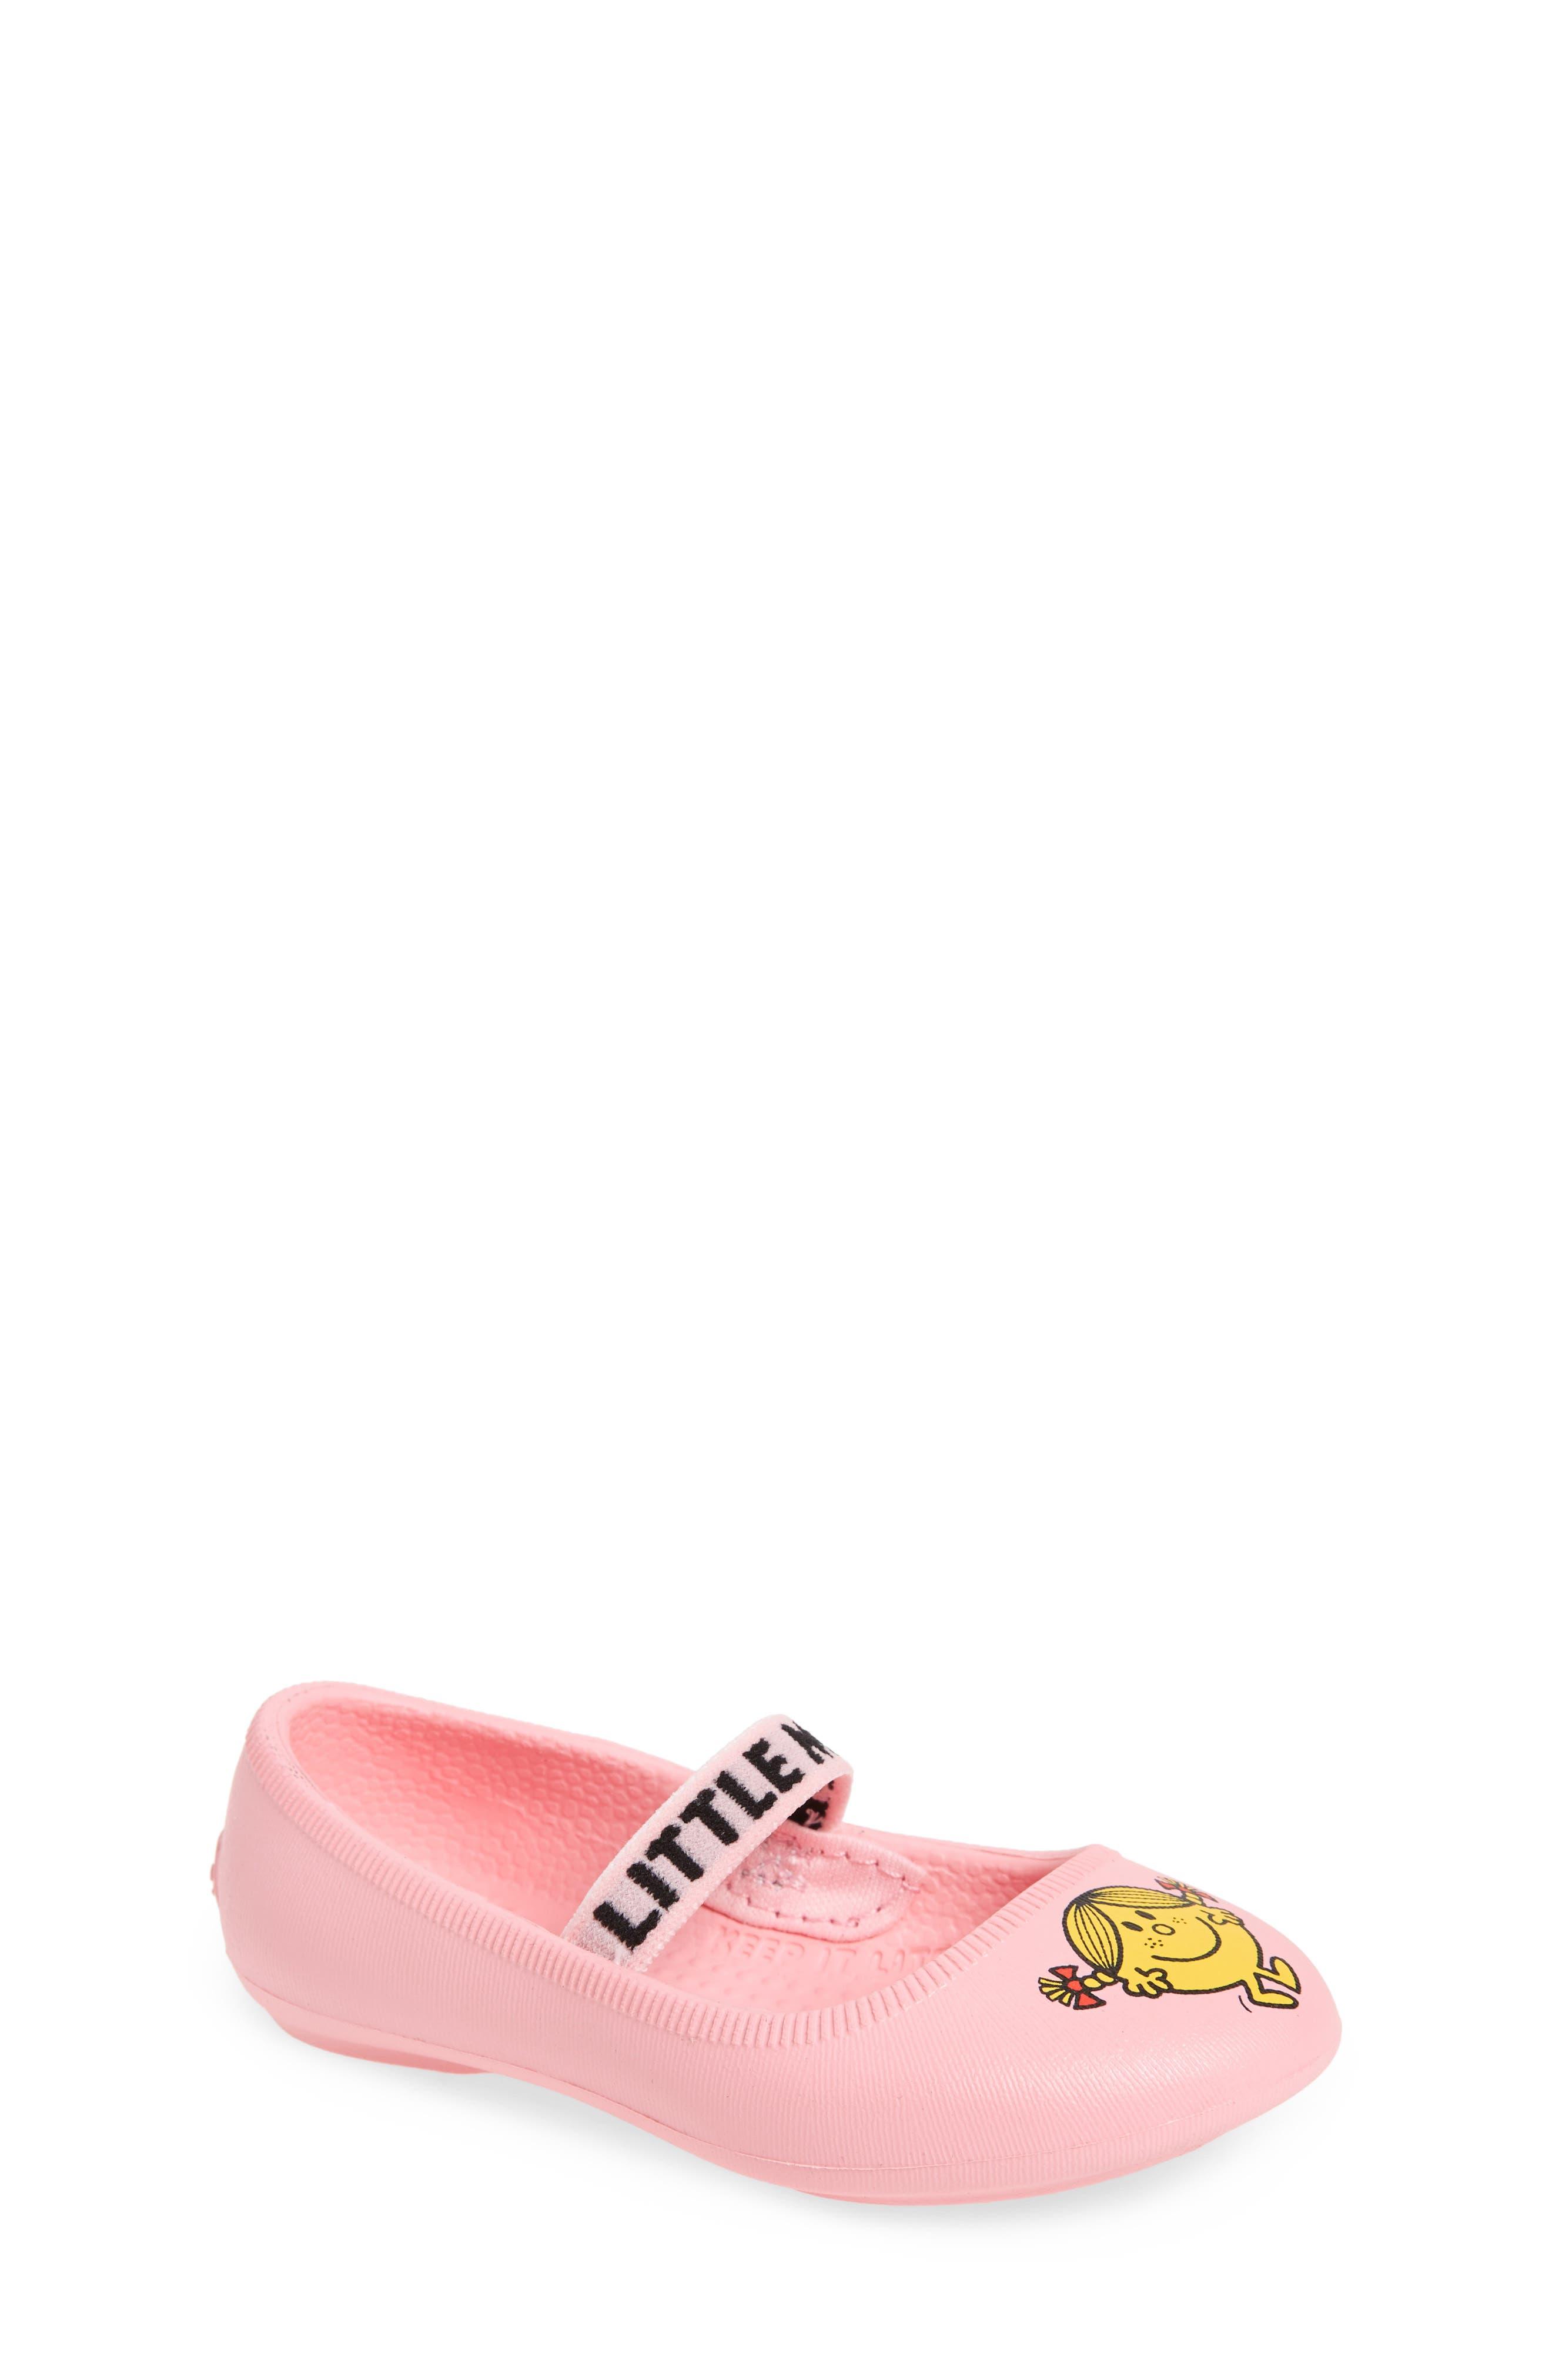 Native Shoes Margot Mary Jane Flat (Baby, Walker, Toddler & Little Kid)